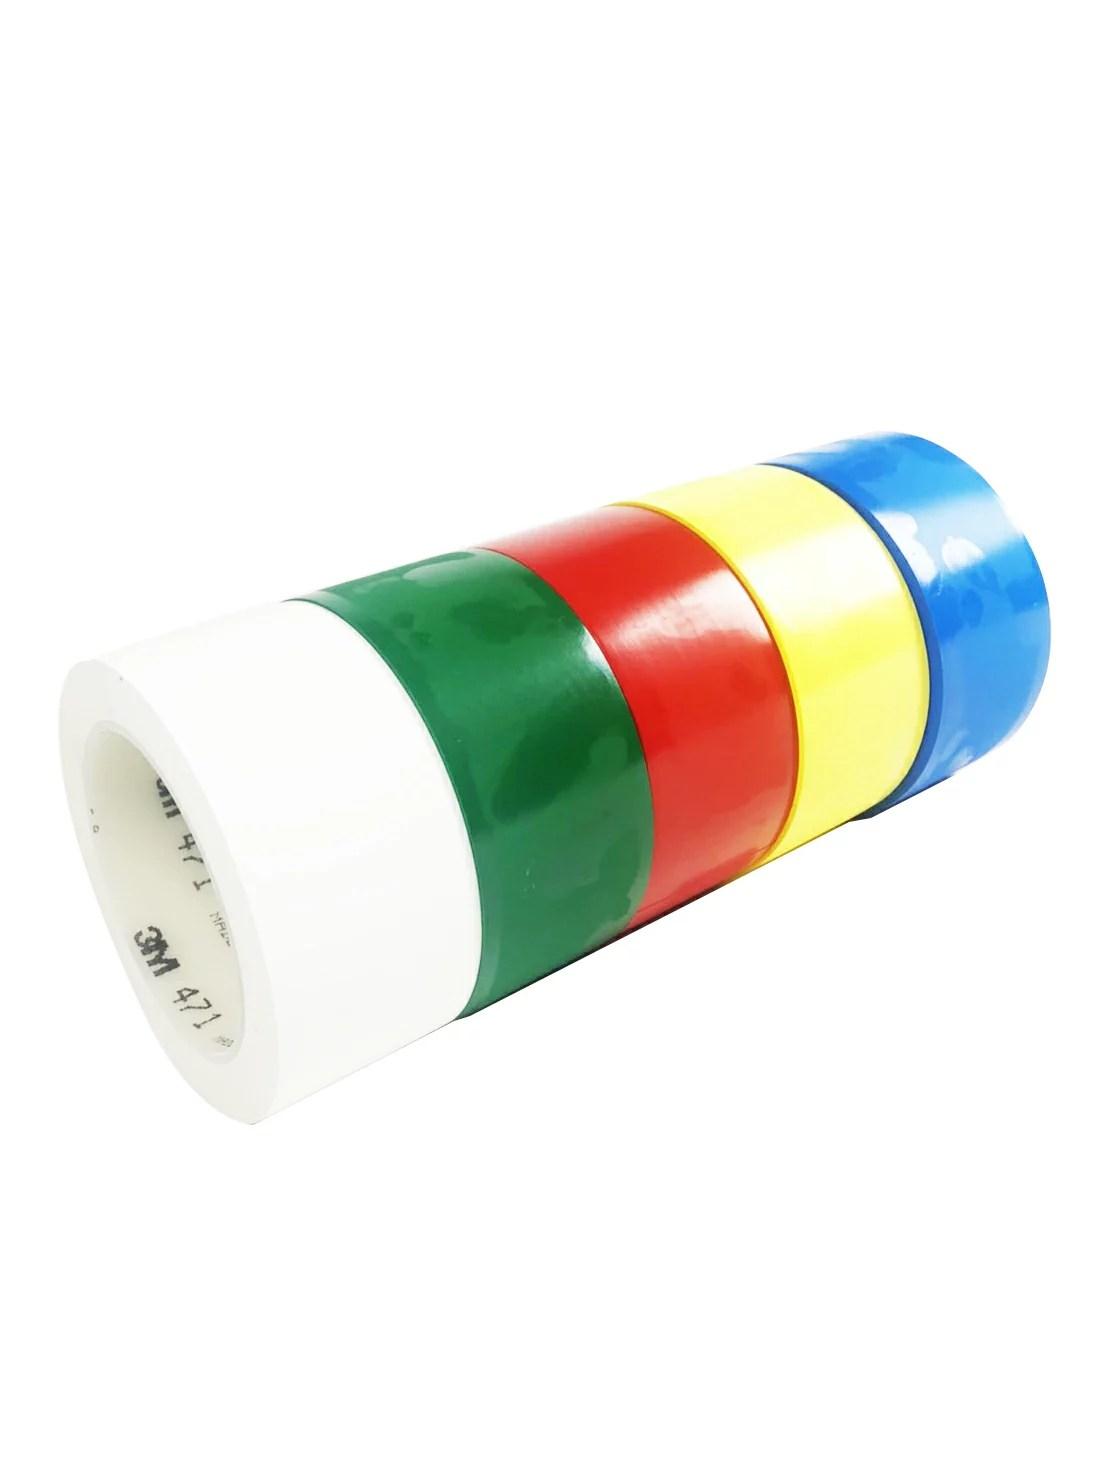 3M 471膠帶 無塵室膠帶 地板膠帶 PVC膠帶 絕緣膠帶 聚氯乙烯膠帶   生活Q小舖 - Rakuten樂天市場